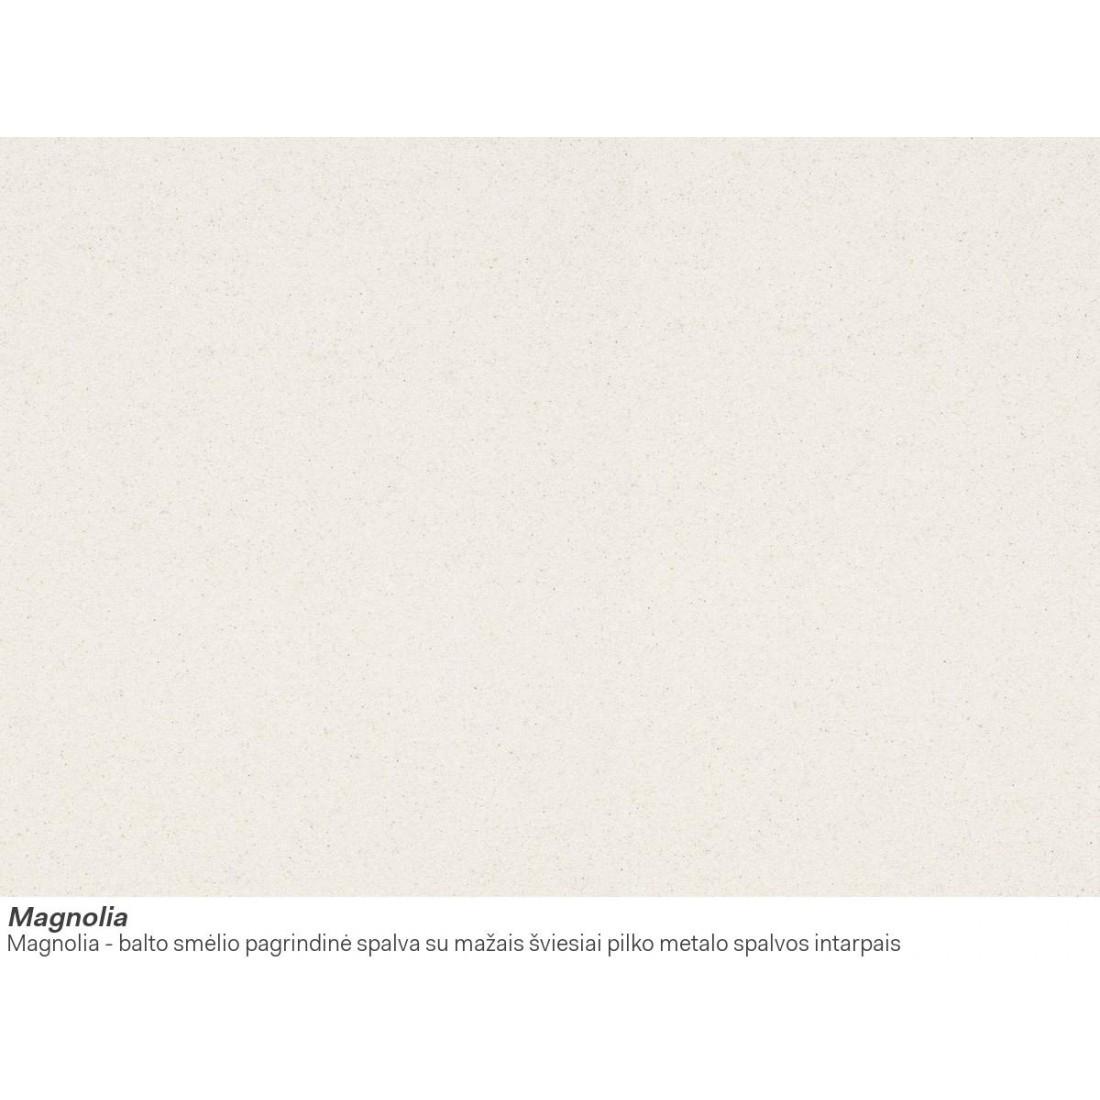 Akmens masės plautuvė Franke Maris MRG 611-62, Magnolia